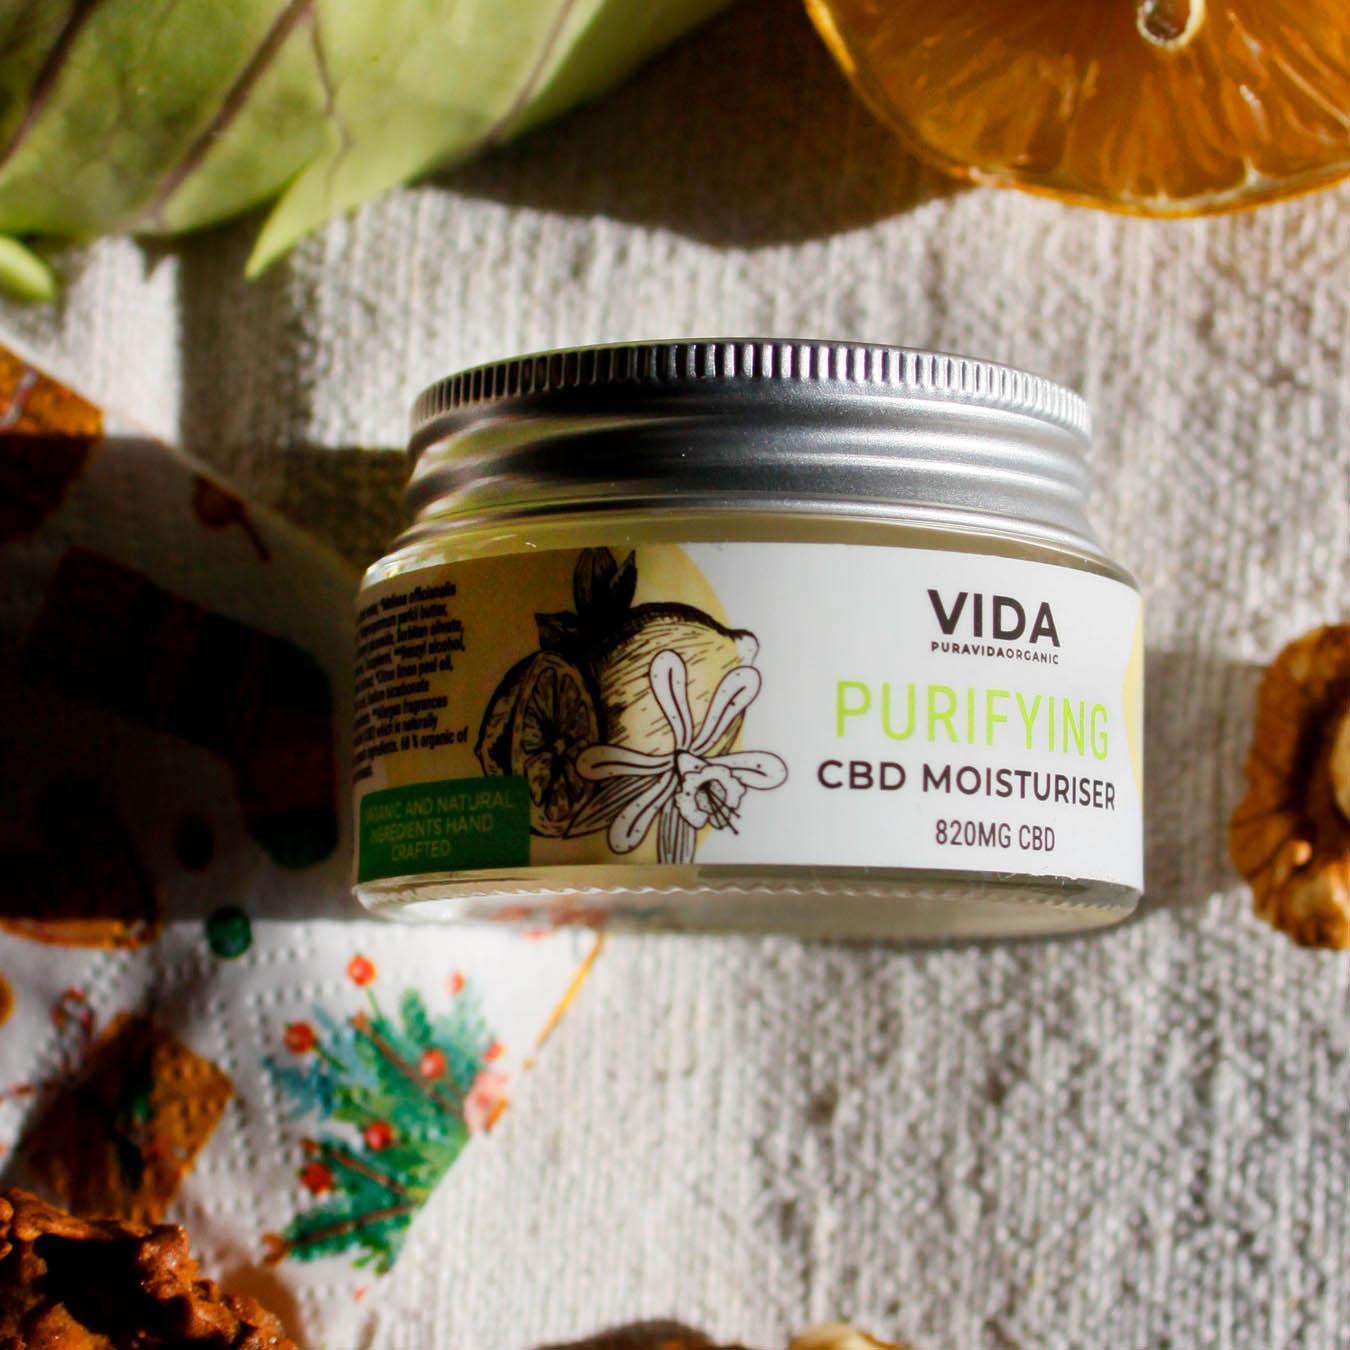 Purifying CBD moisturiser od Pura Vida Organic